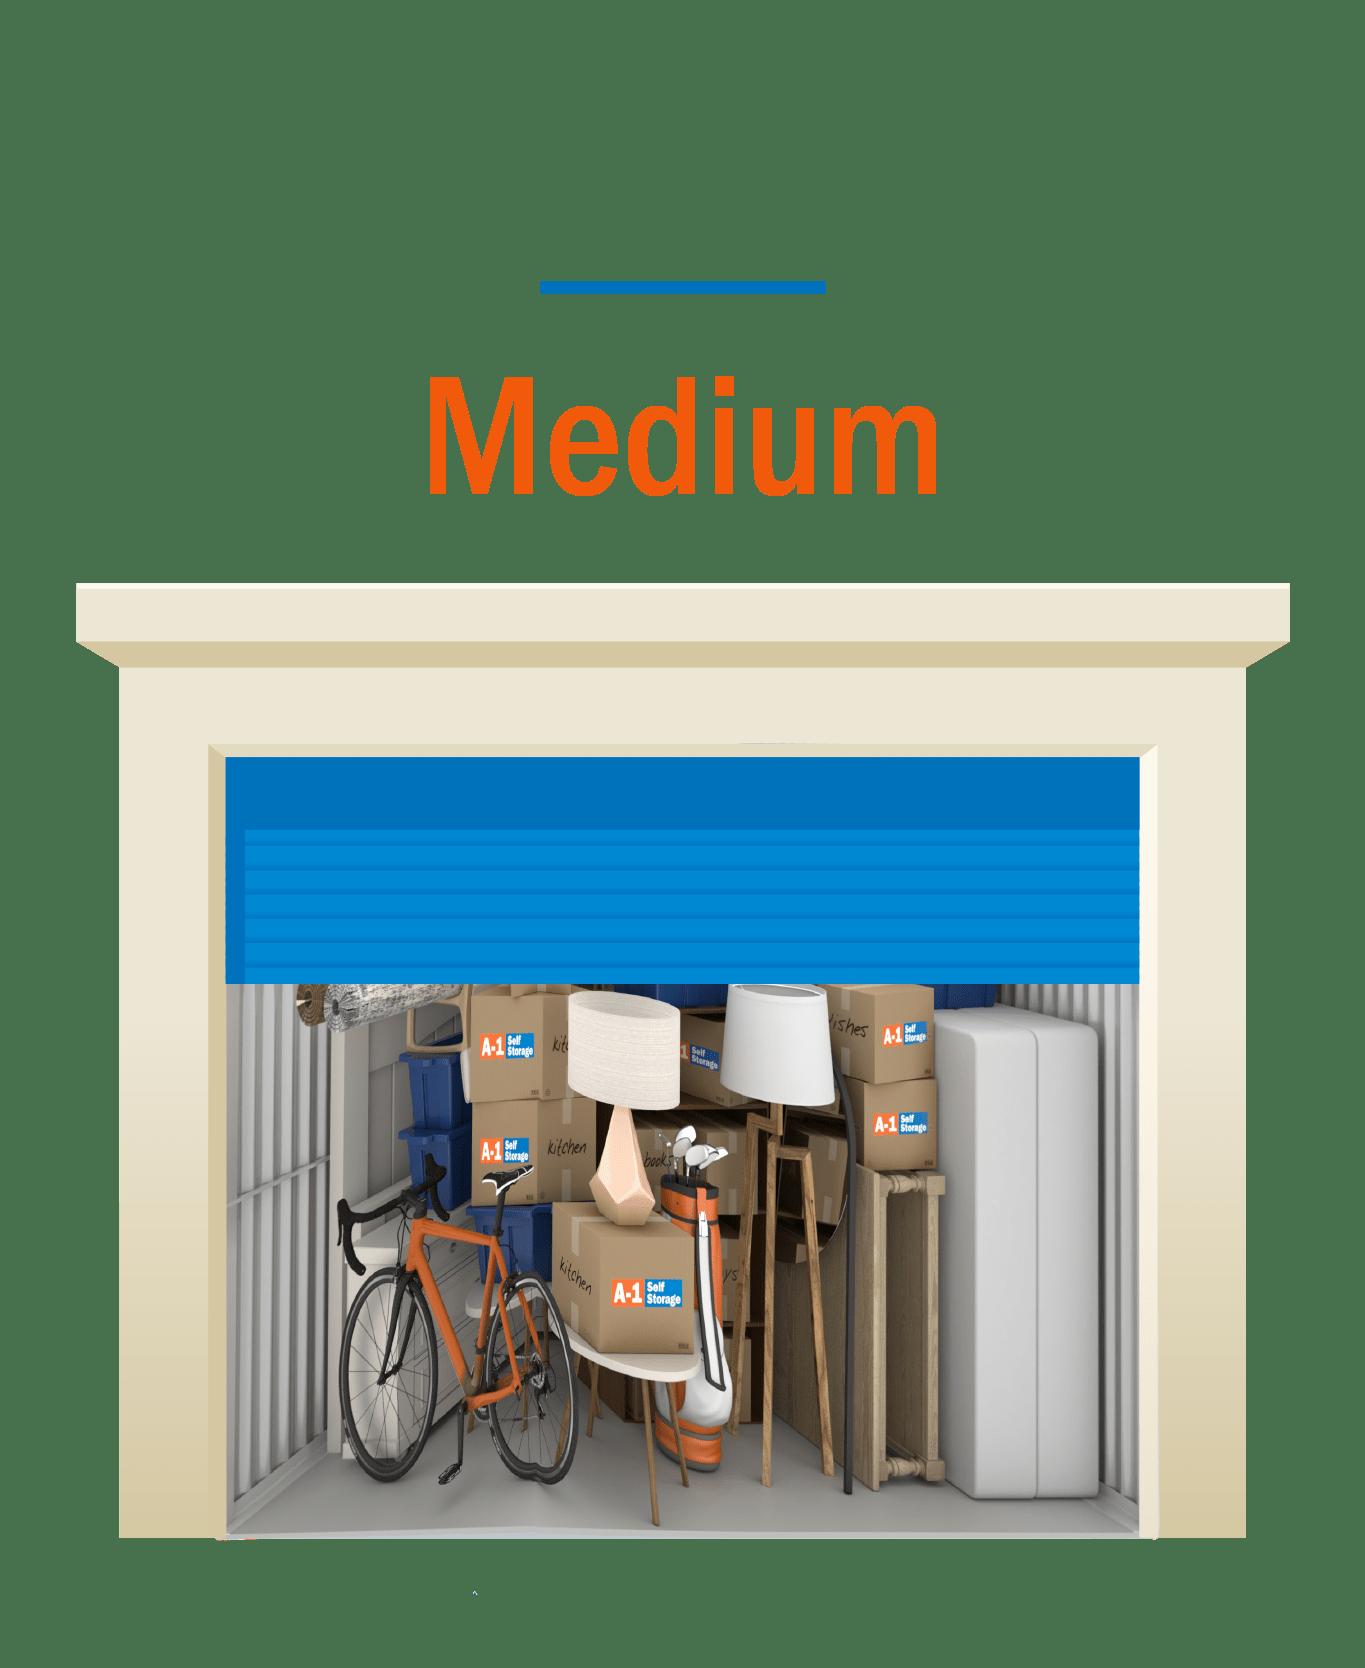 Medium storage unit graphic, door open